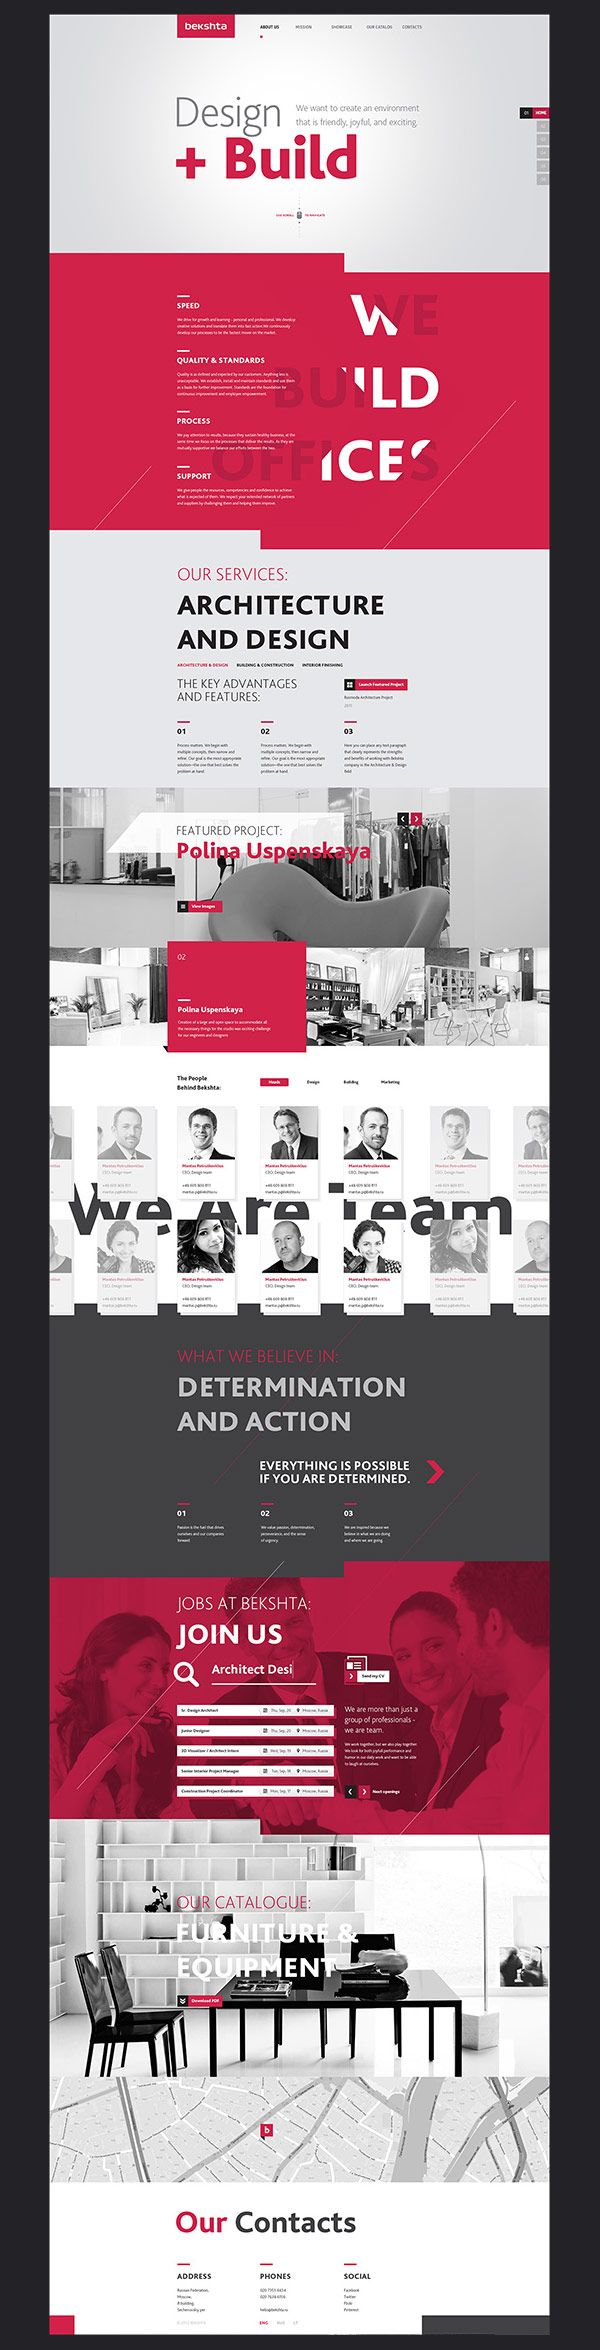 Corporate Website Design For Bekshta Corporate Website Design Web Design Creative Web Design